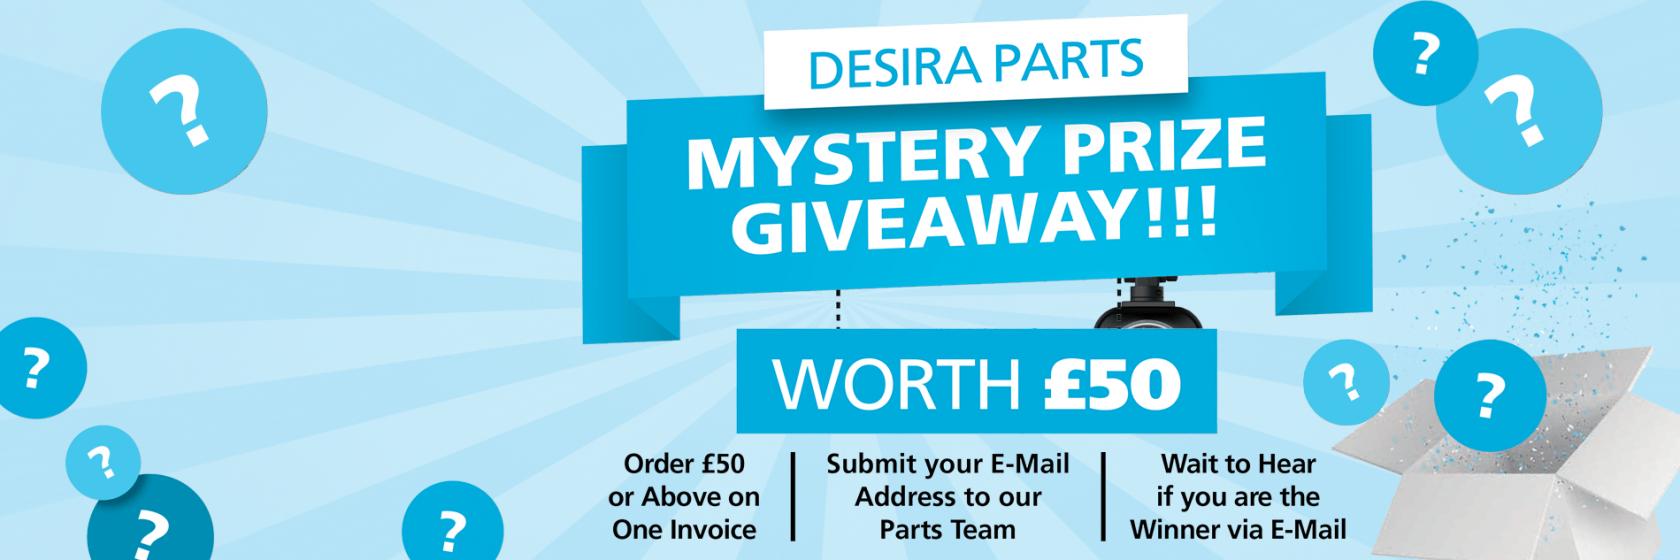 Desira Parts Prize Draw